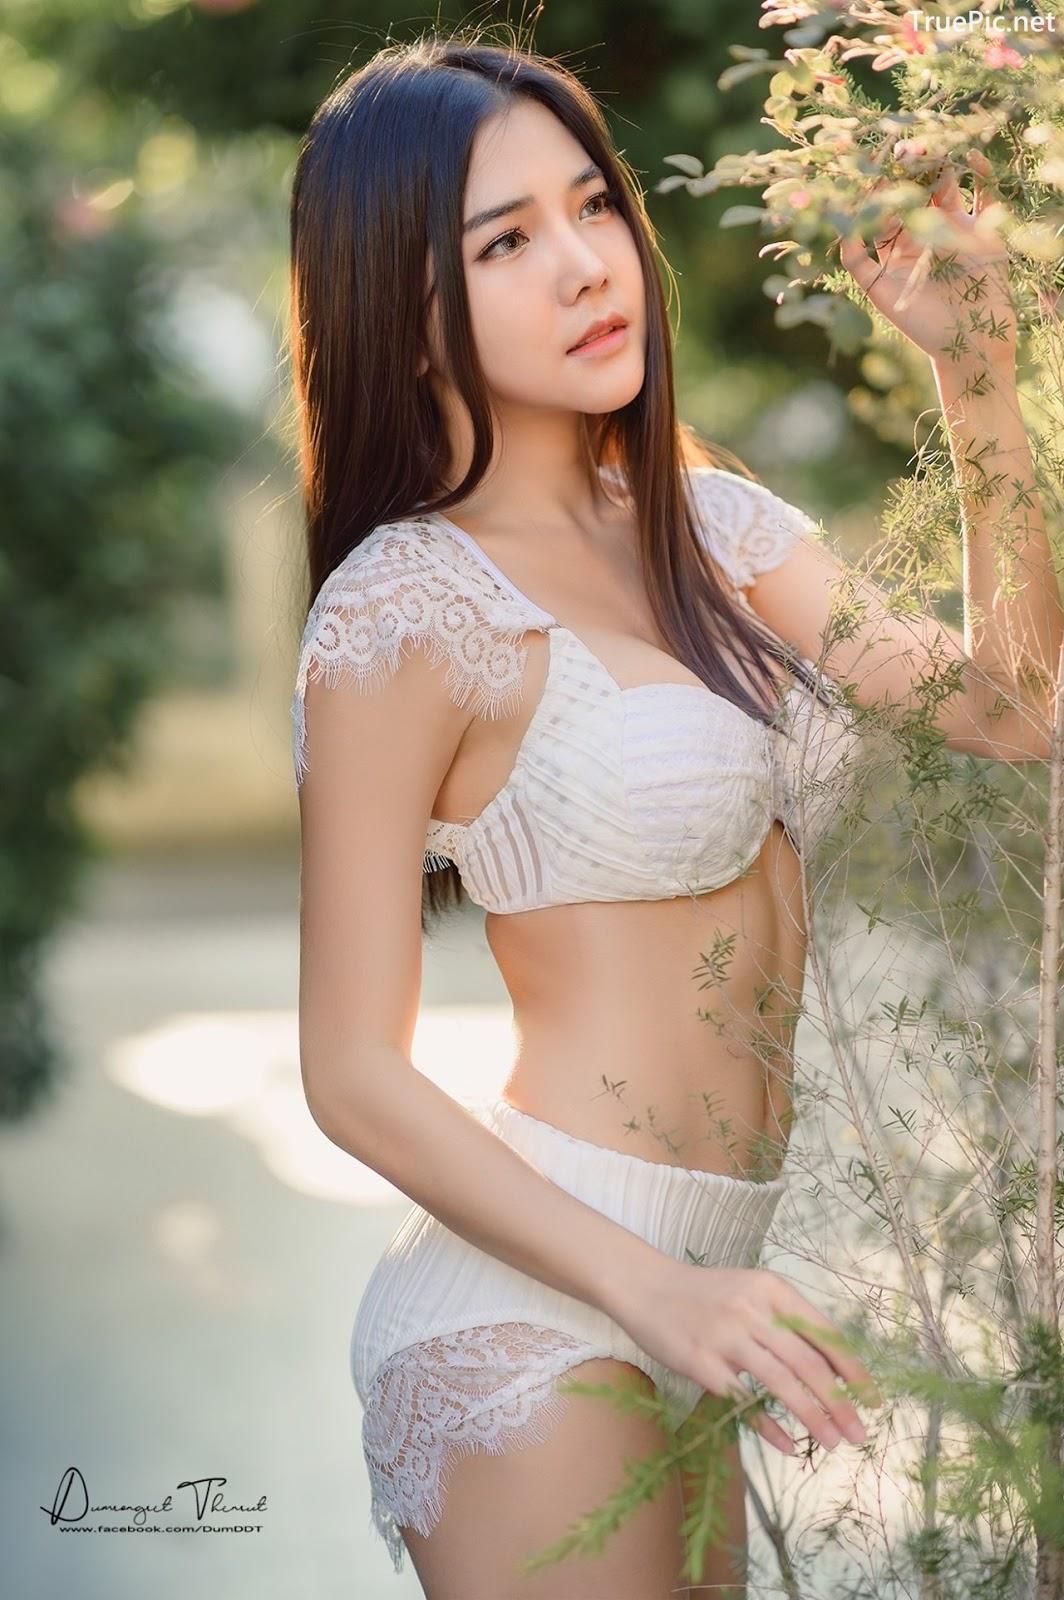 Image Thailand Model - Phitchamol Srijantanet - White Crochet Bikini - TruePic.net - Picture-4